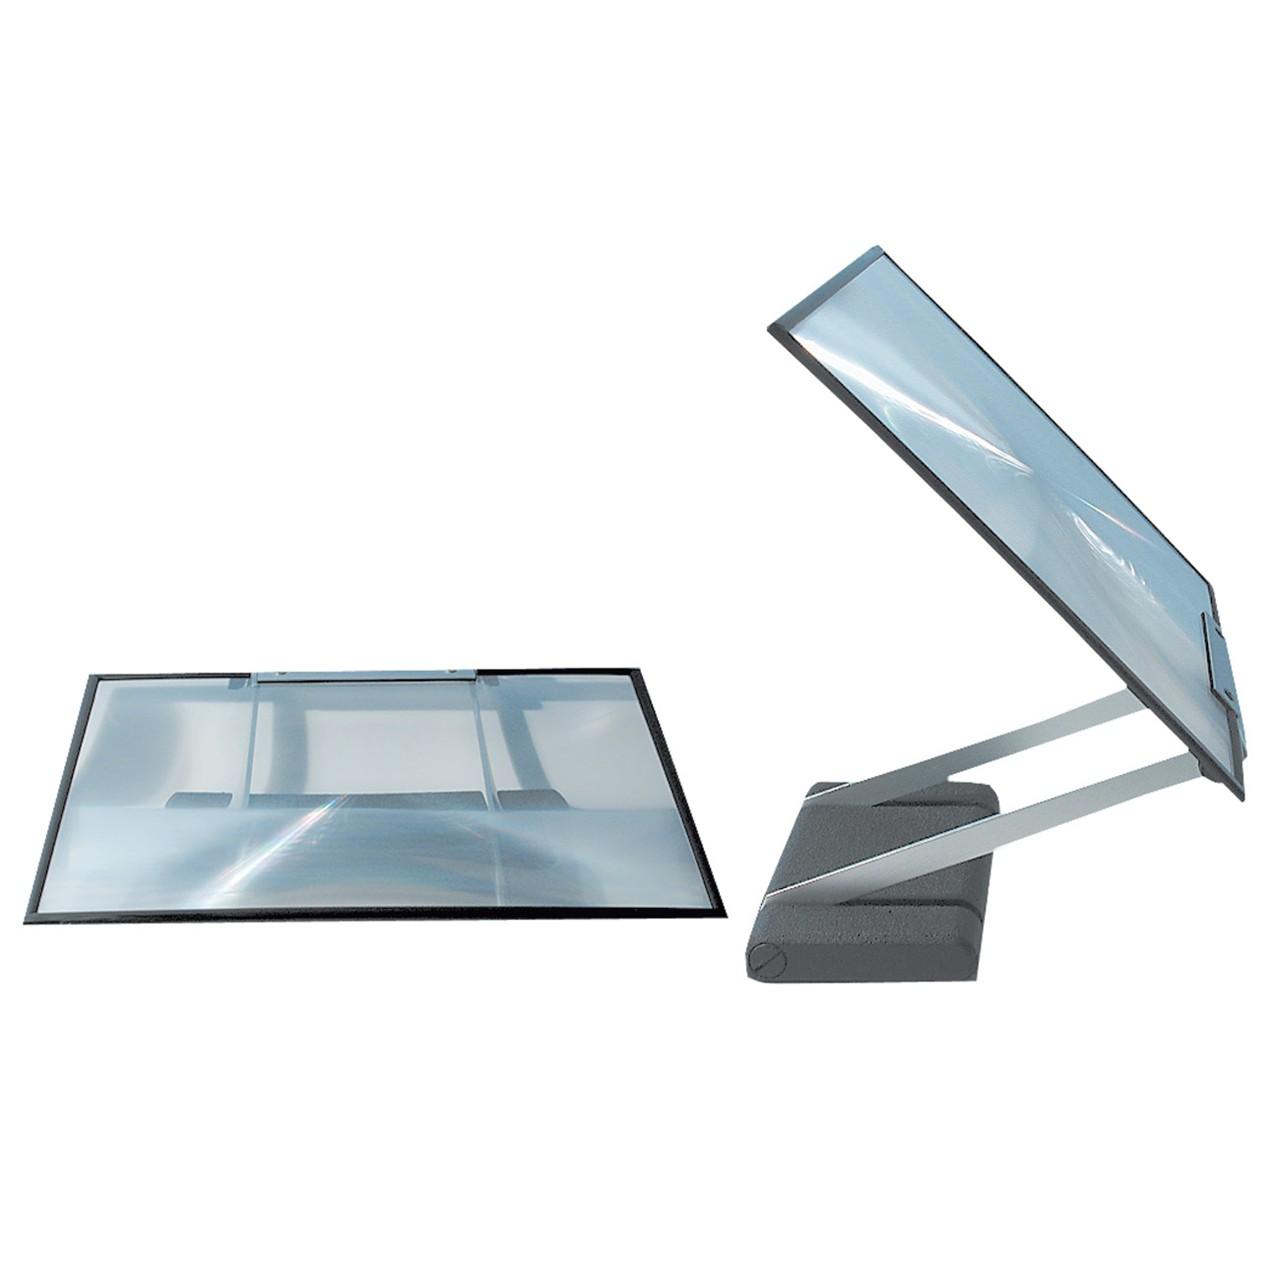 Reizen Fresnel Computer-Stand Magnifier